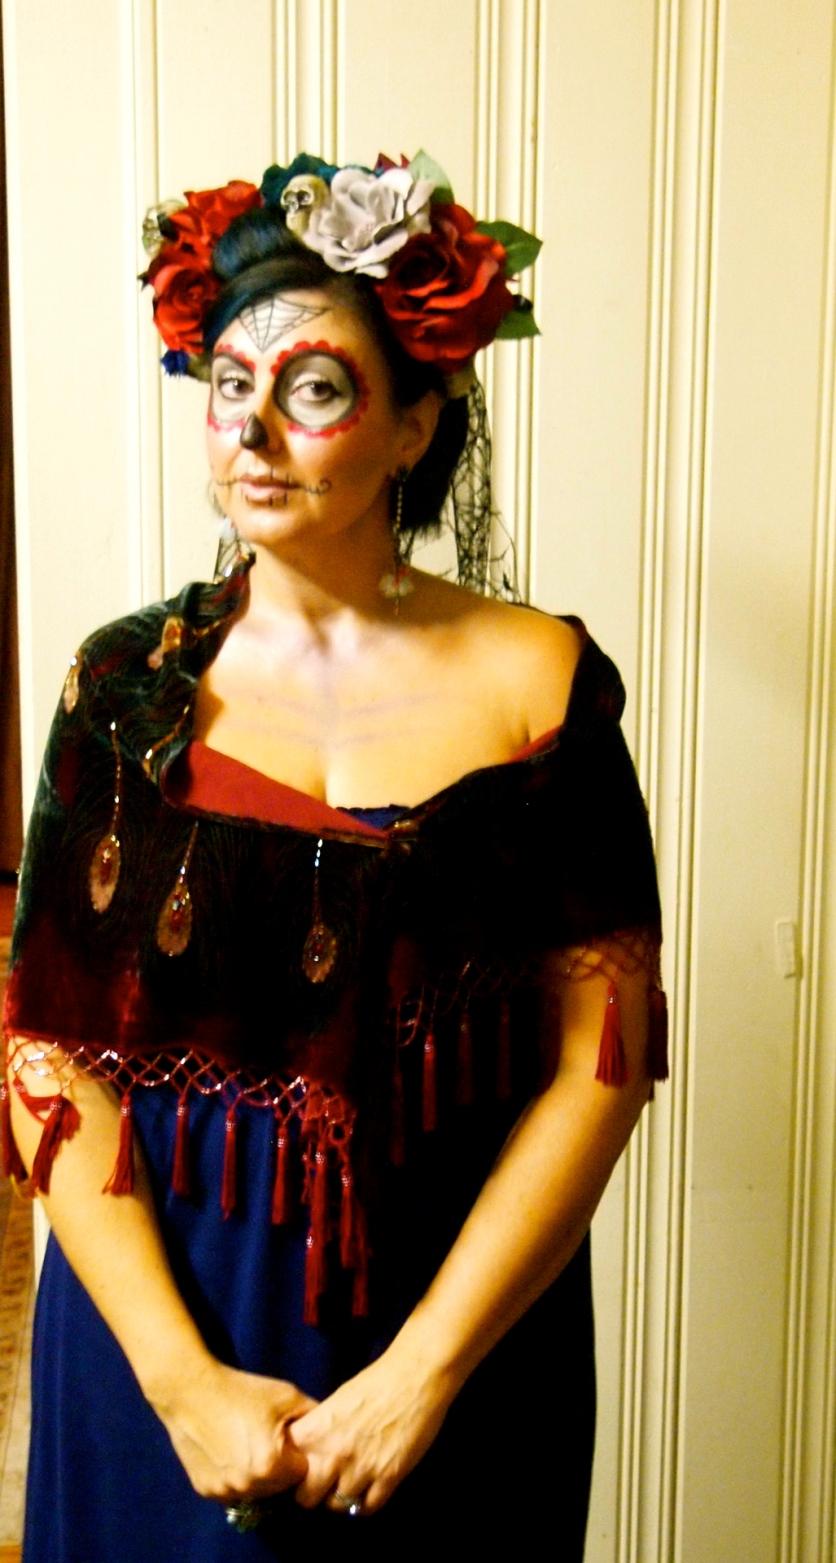 La Muerta - day of the dead